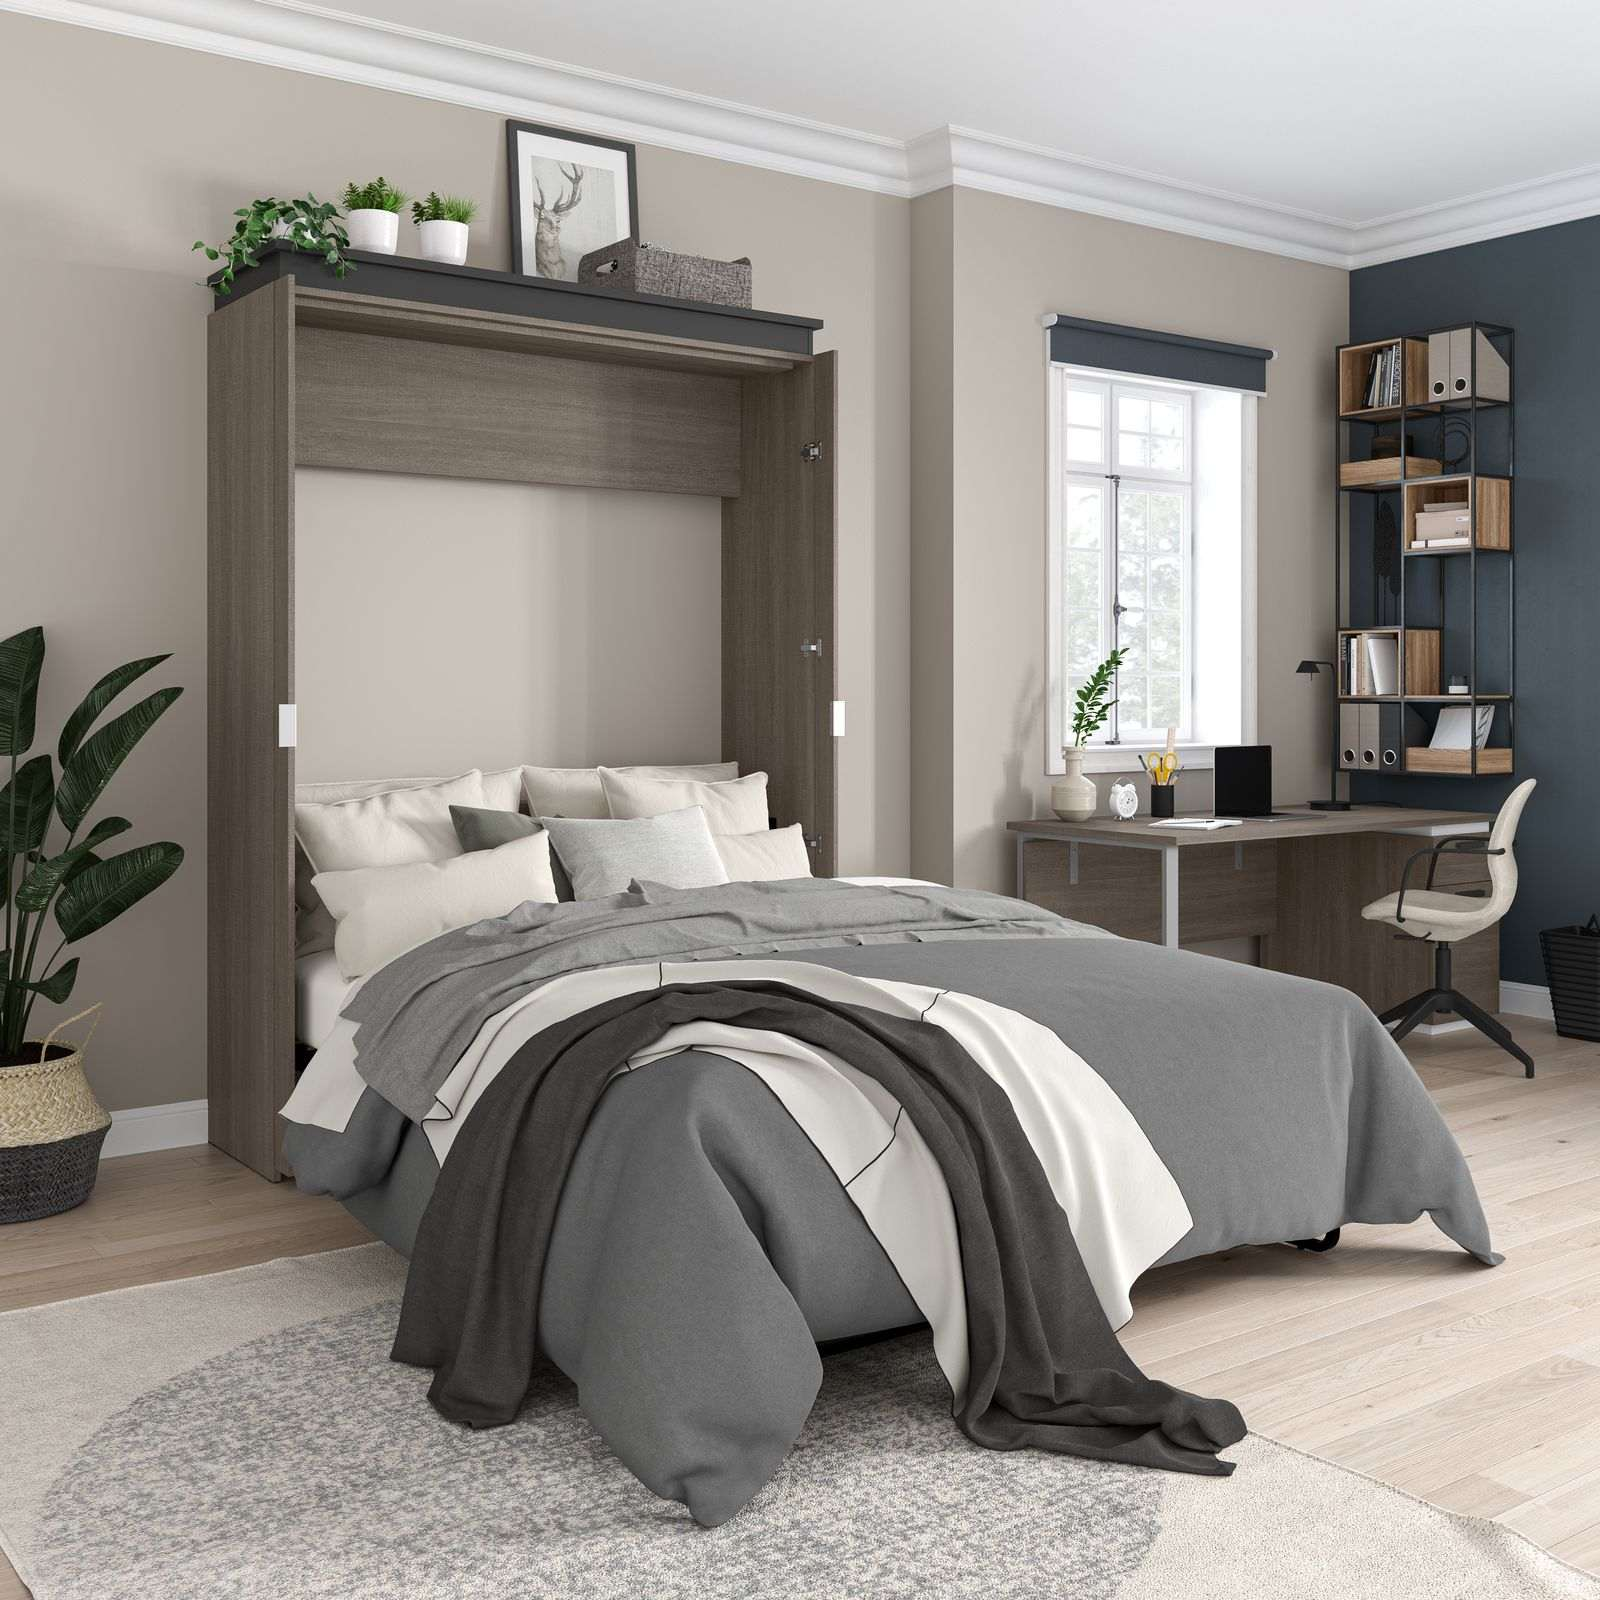 Multipurpose room with a Bestar modern Murphy Bed